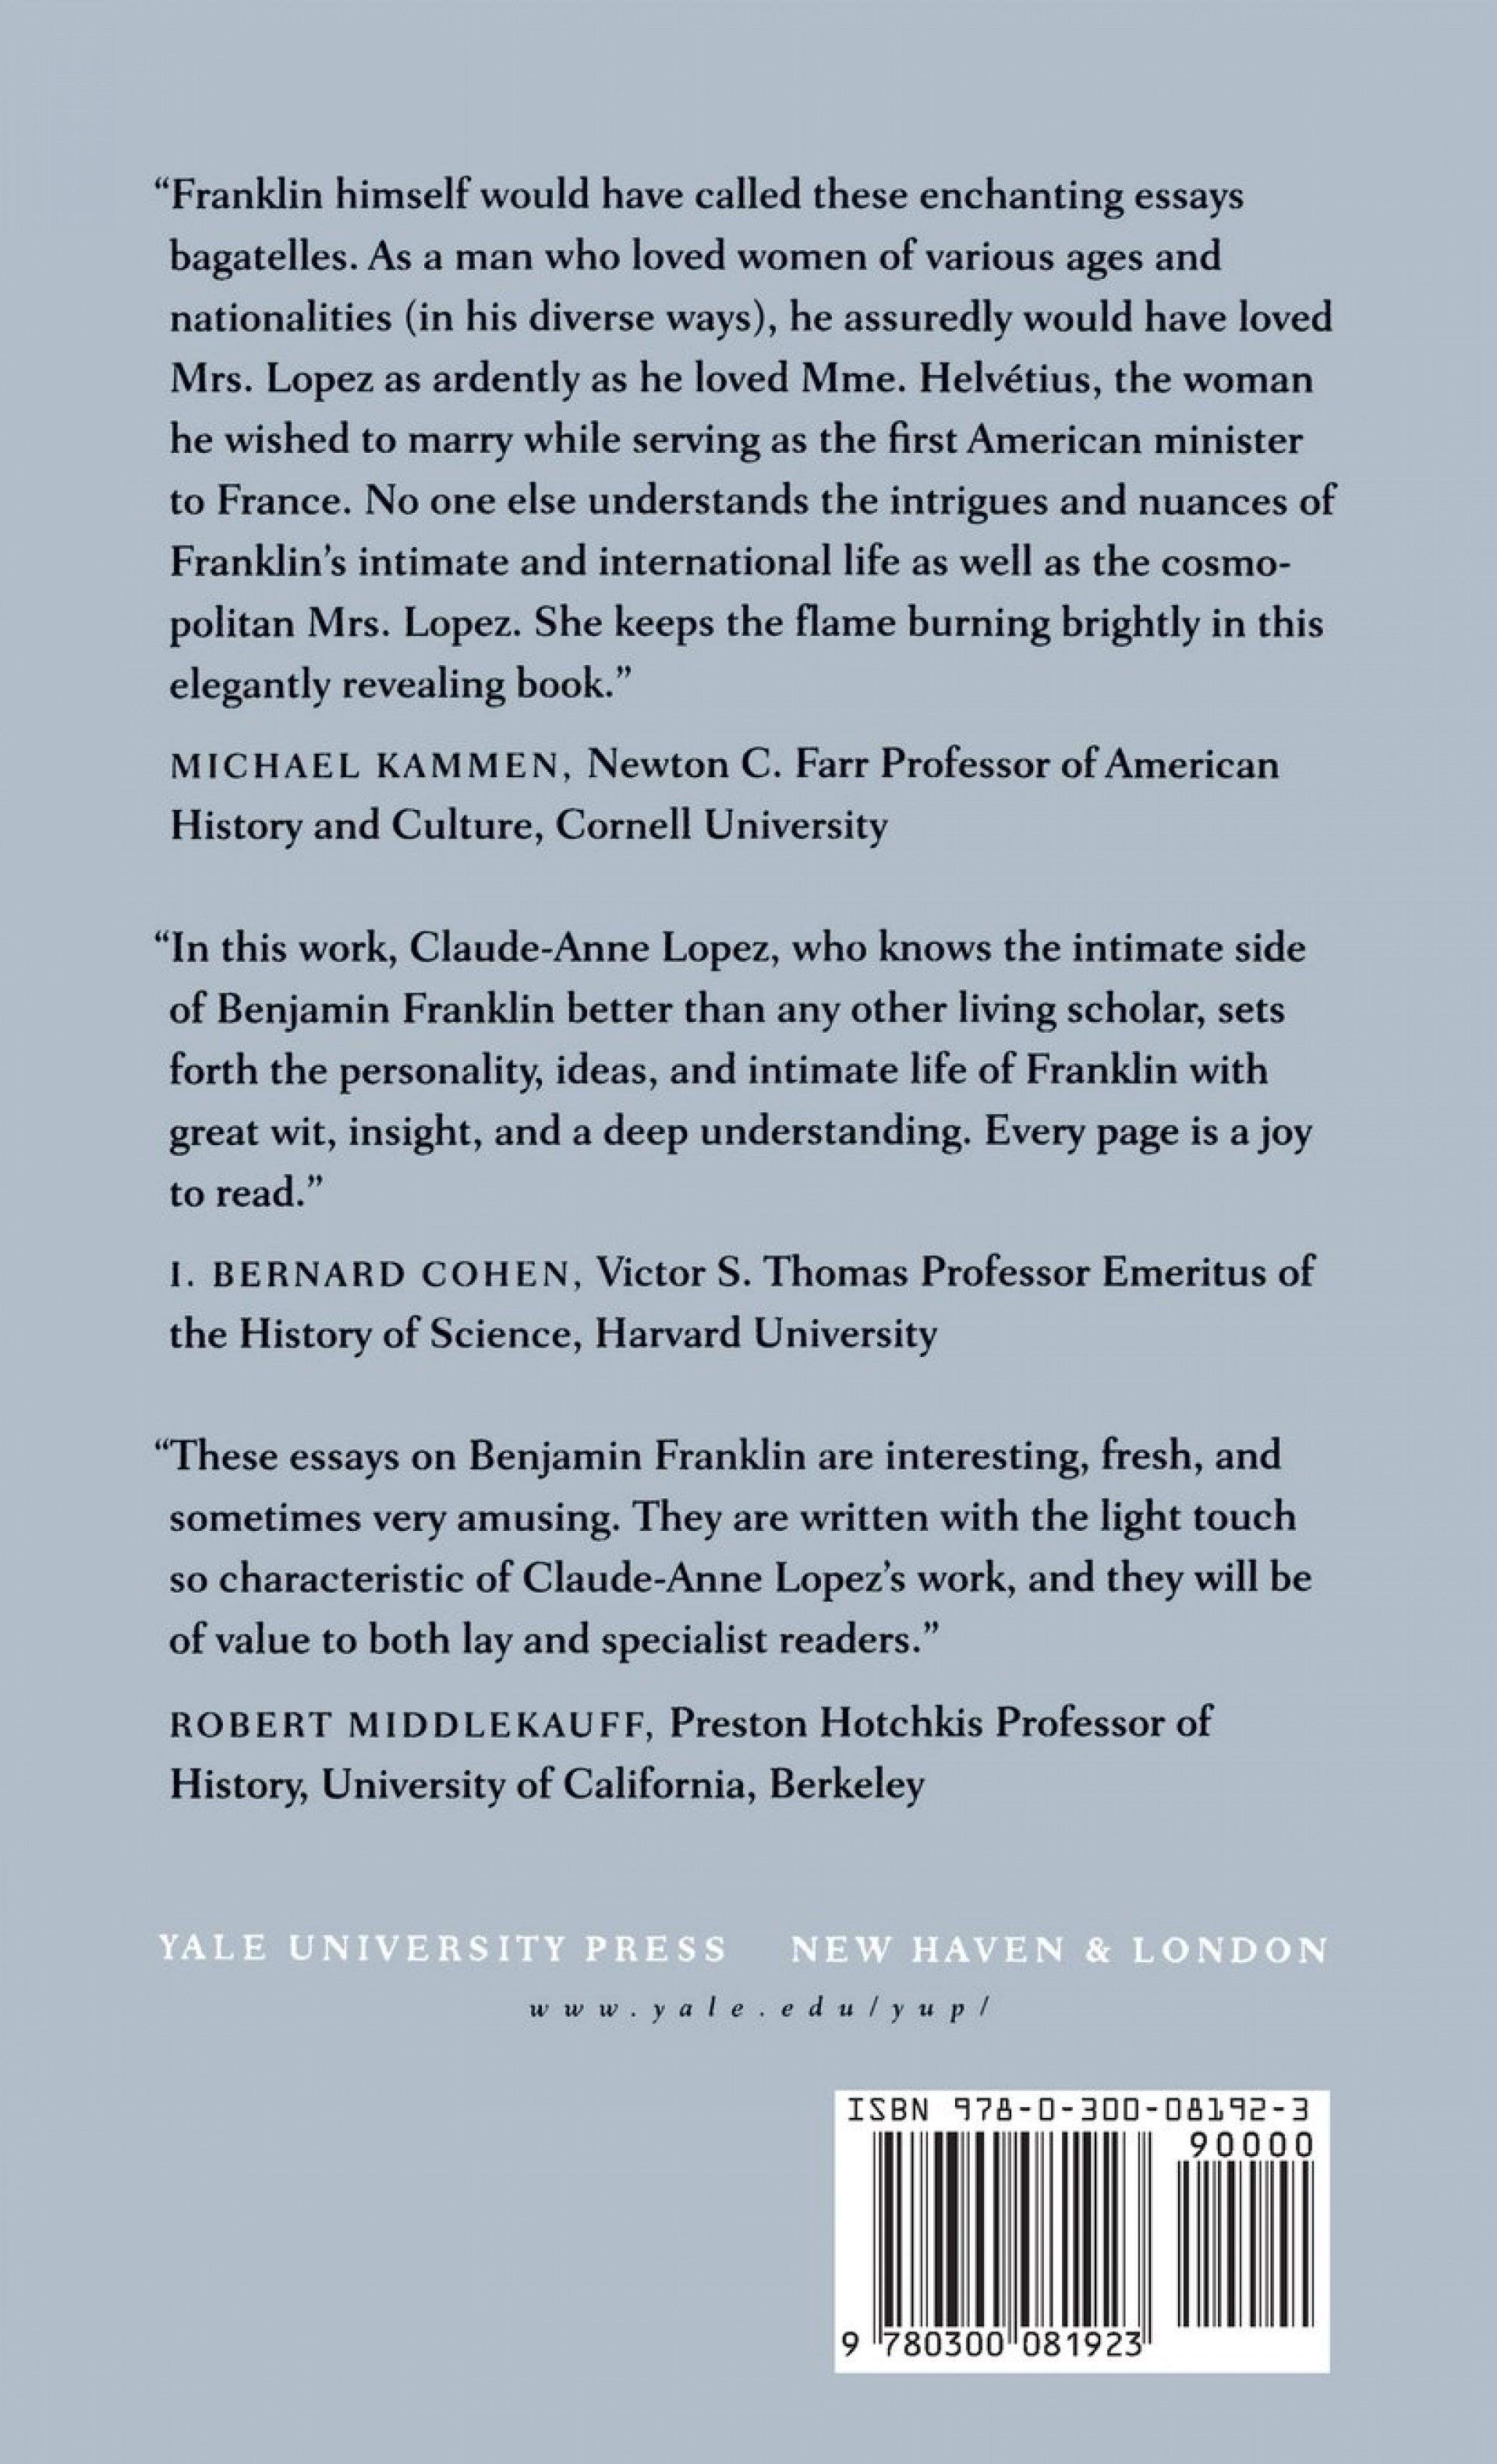 008 71domzzg7cl Benjamin Franklin Essay Unbelievable Thesis Statement Conclusion 1920